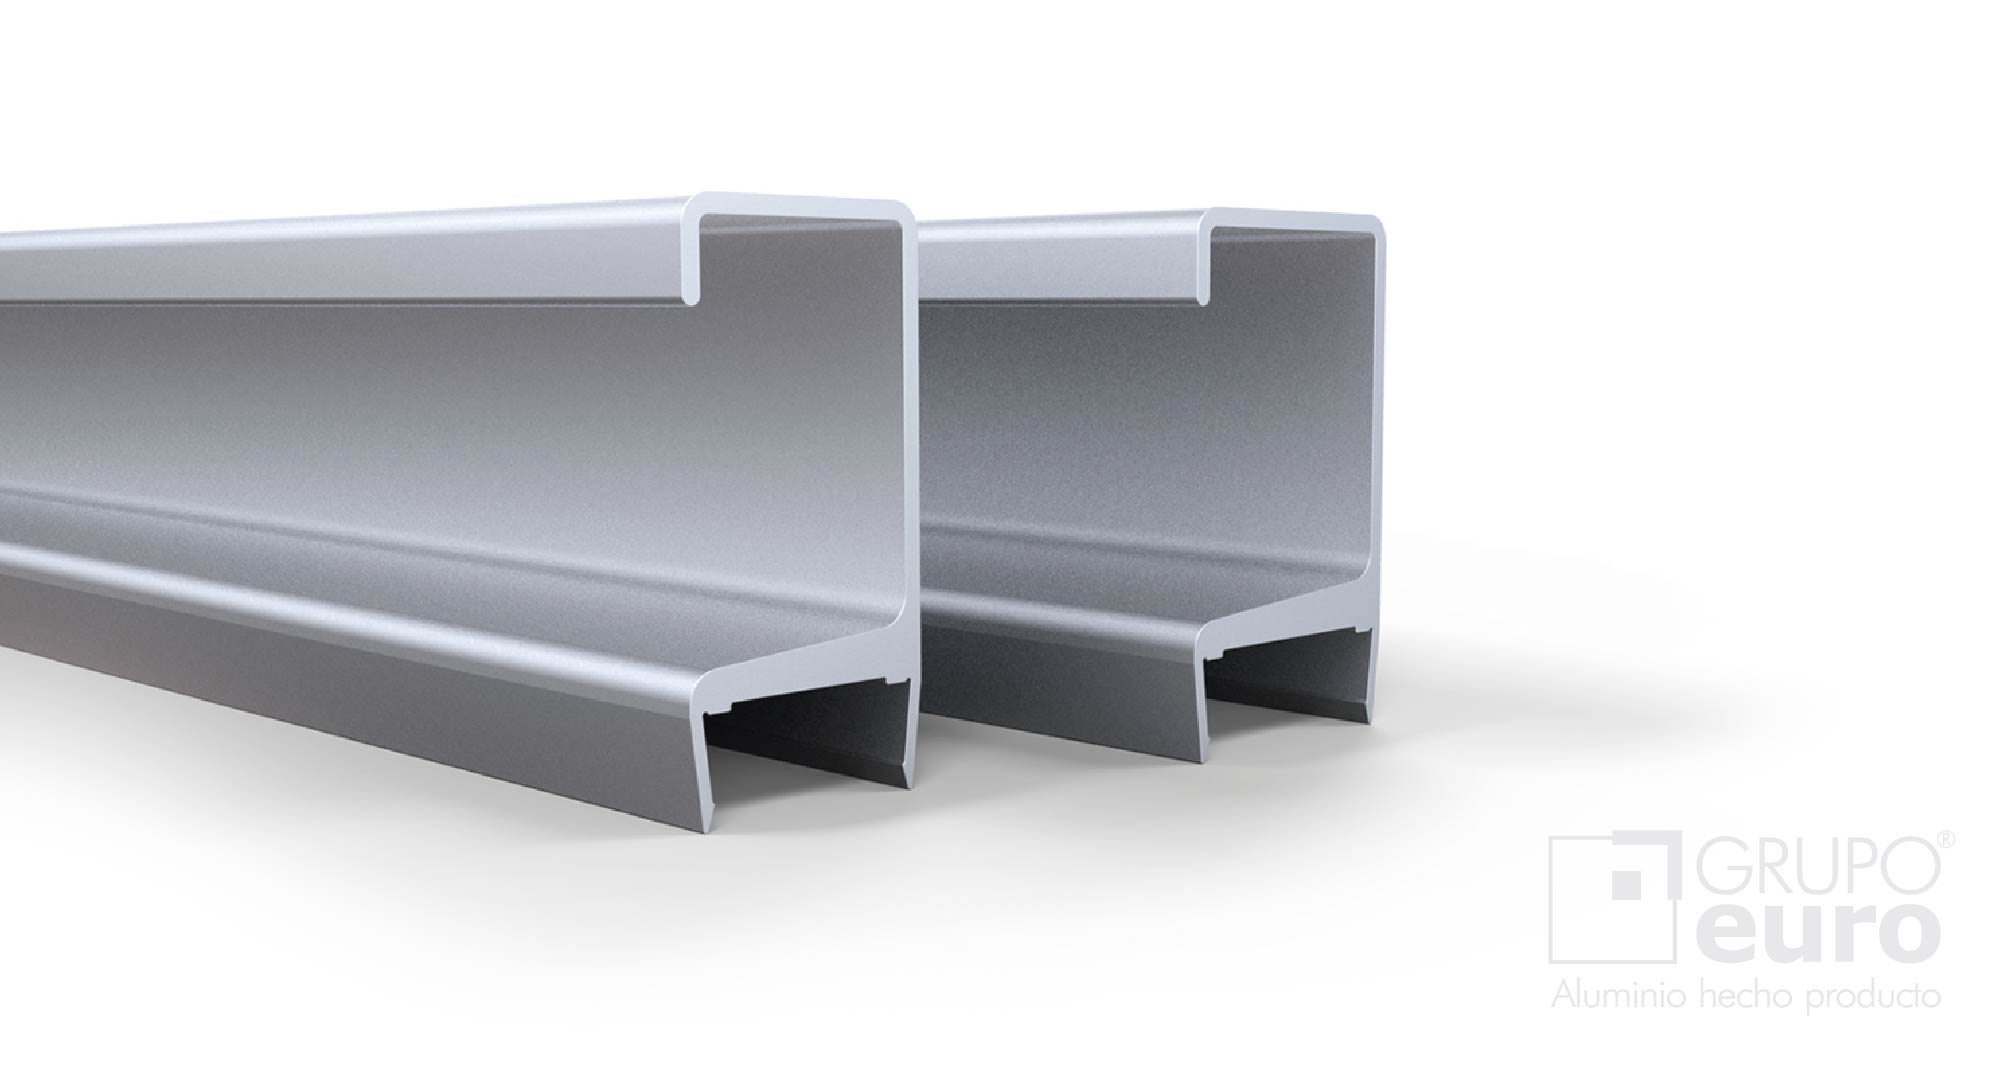 Perfil mj aluminio mc15 mc18 herrajes oeste for Perfiles aluminio para muebles